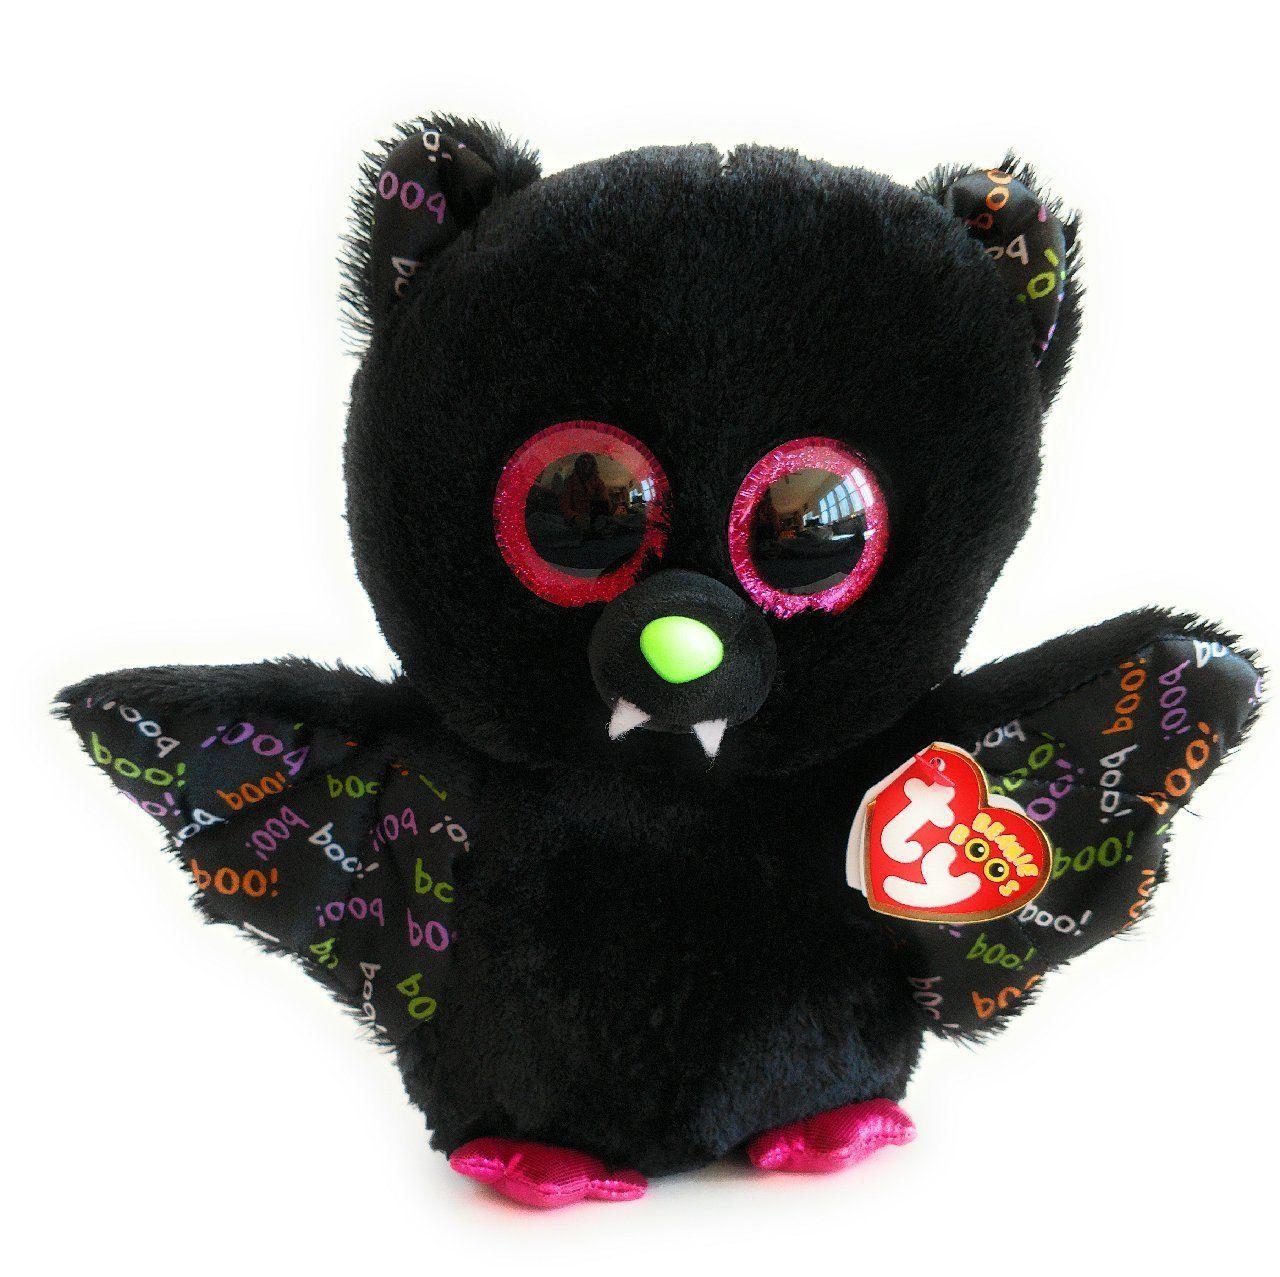 8023aa5e3b4 Ty Halloween Beanie Boos Dart the Bat Medium and 50 similar items. S l1600